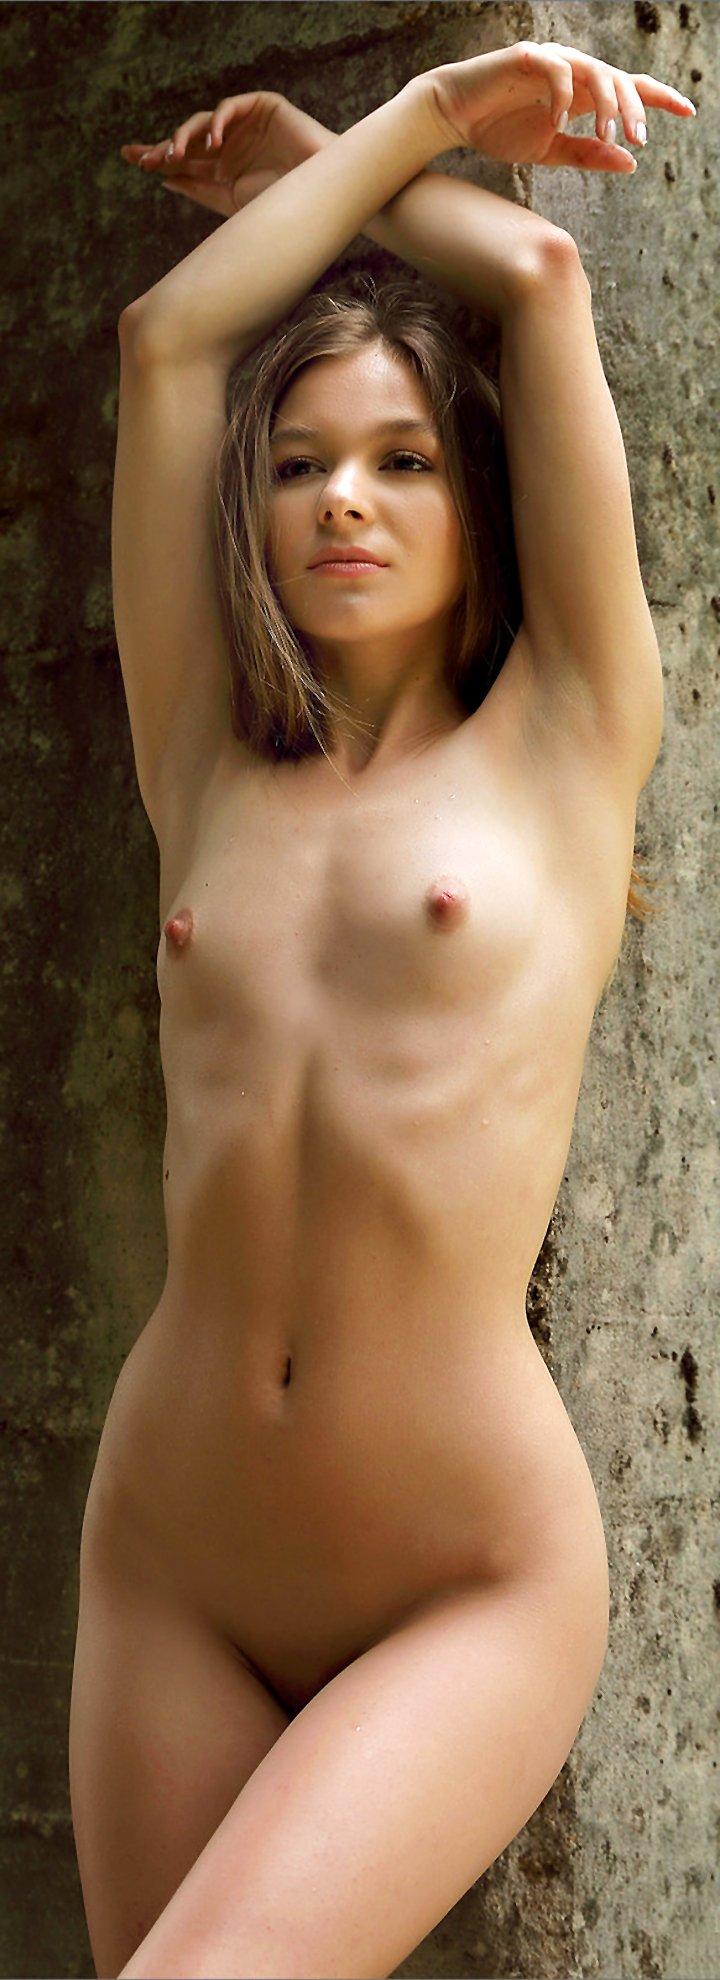 Young cute girl Stefani posing nude in nature